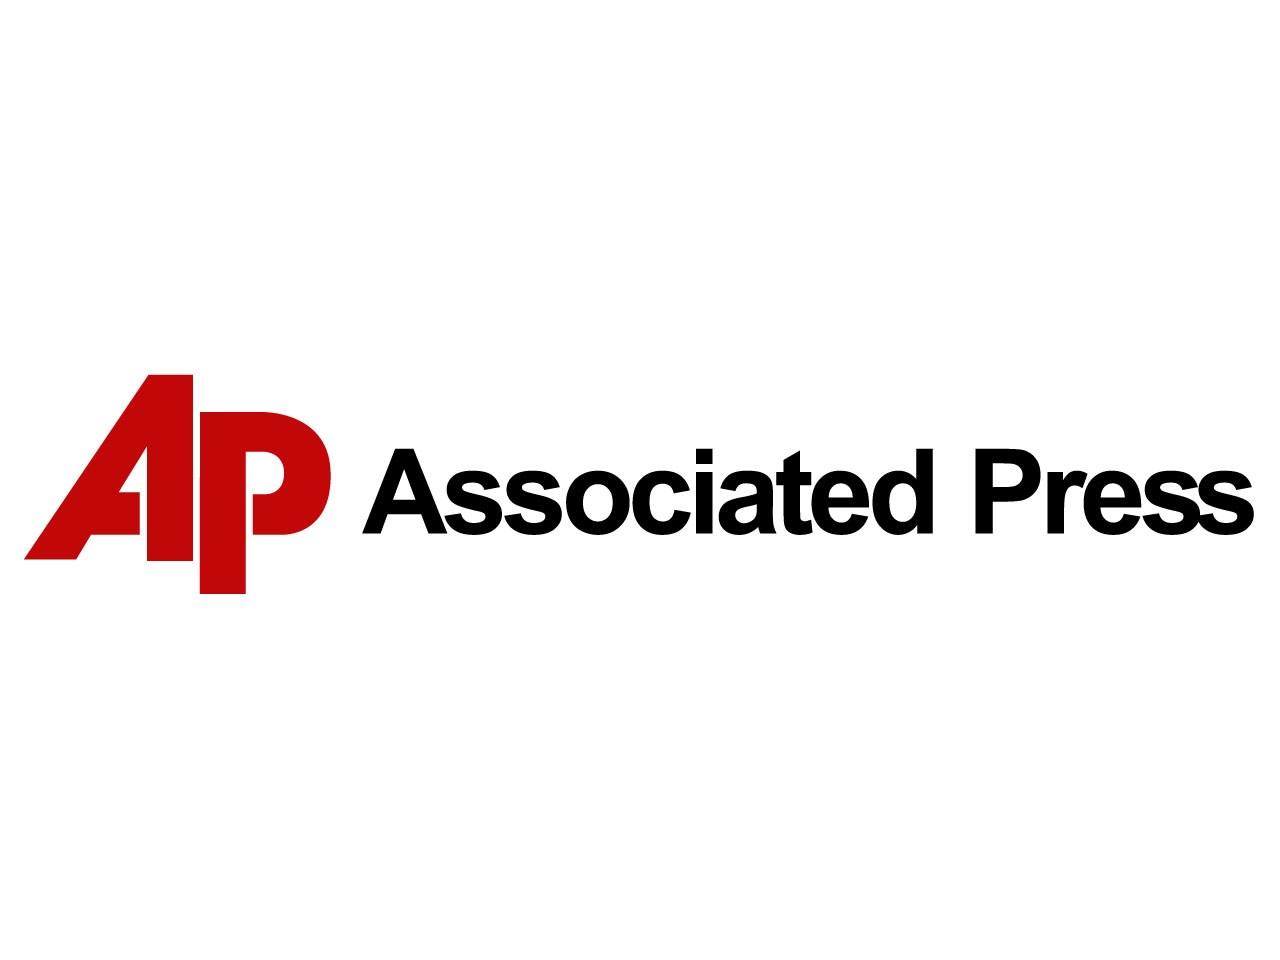 AP Associated Press